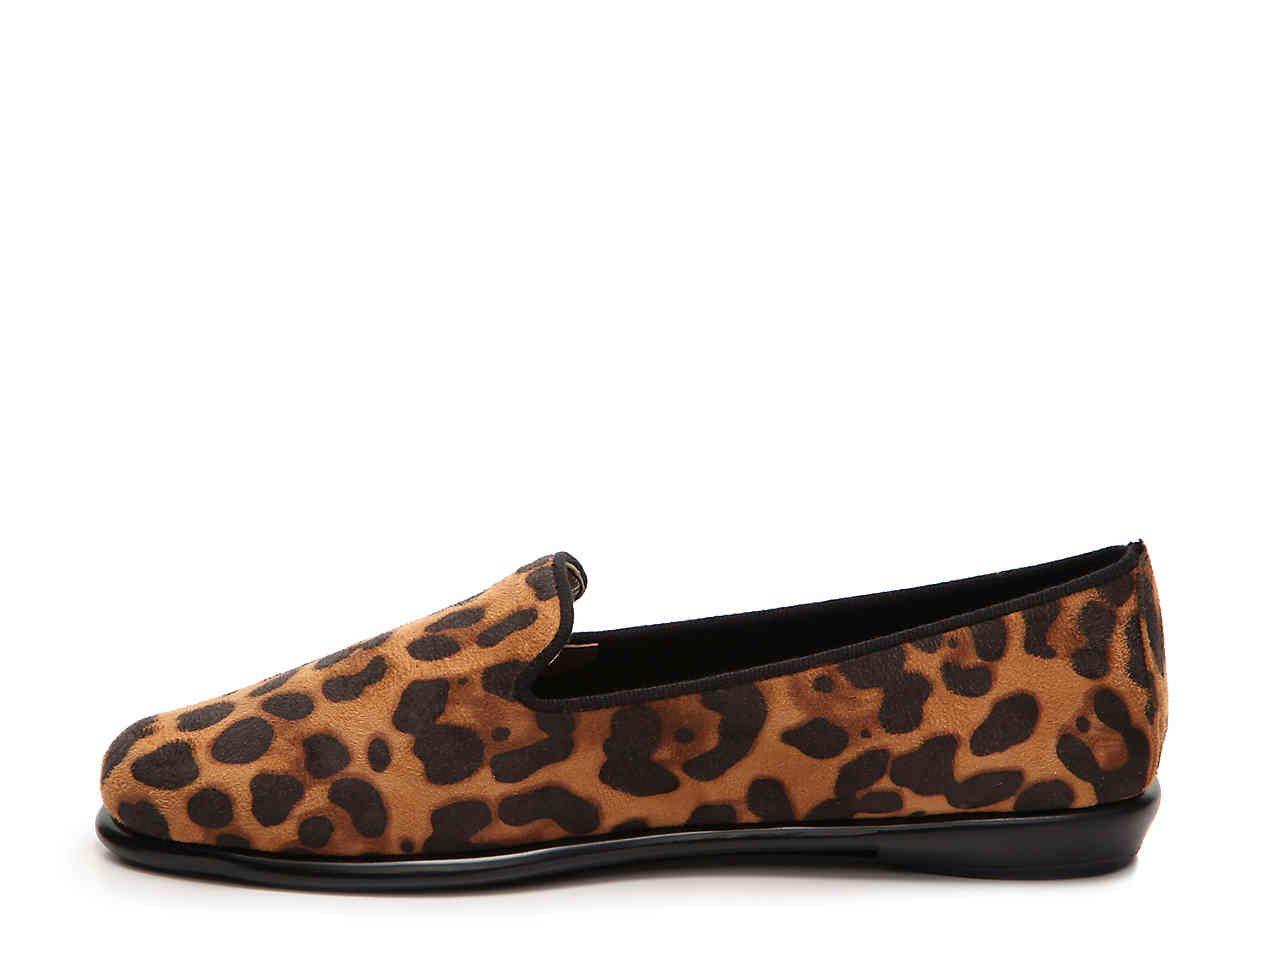 03ec684716f6 Aerosoles Betunia Studded Loafer | DSW | STYLE | Shoe & Accessories ...